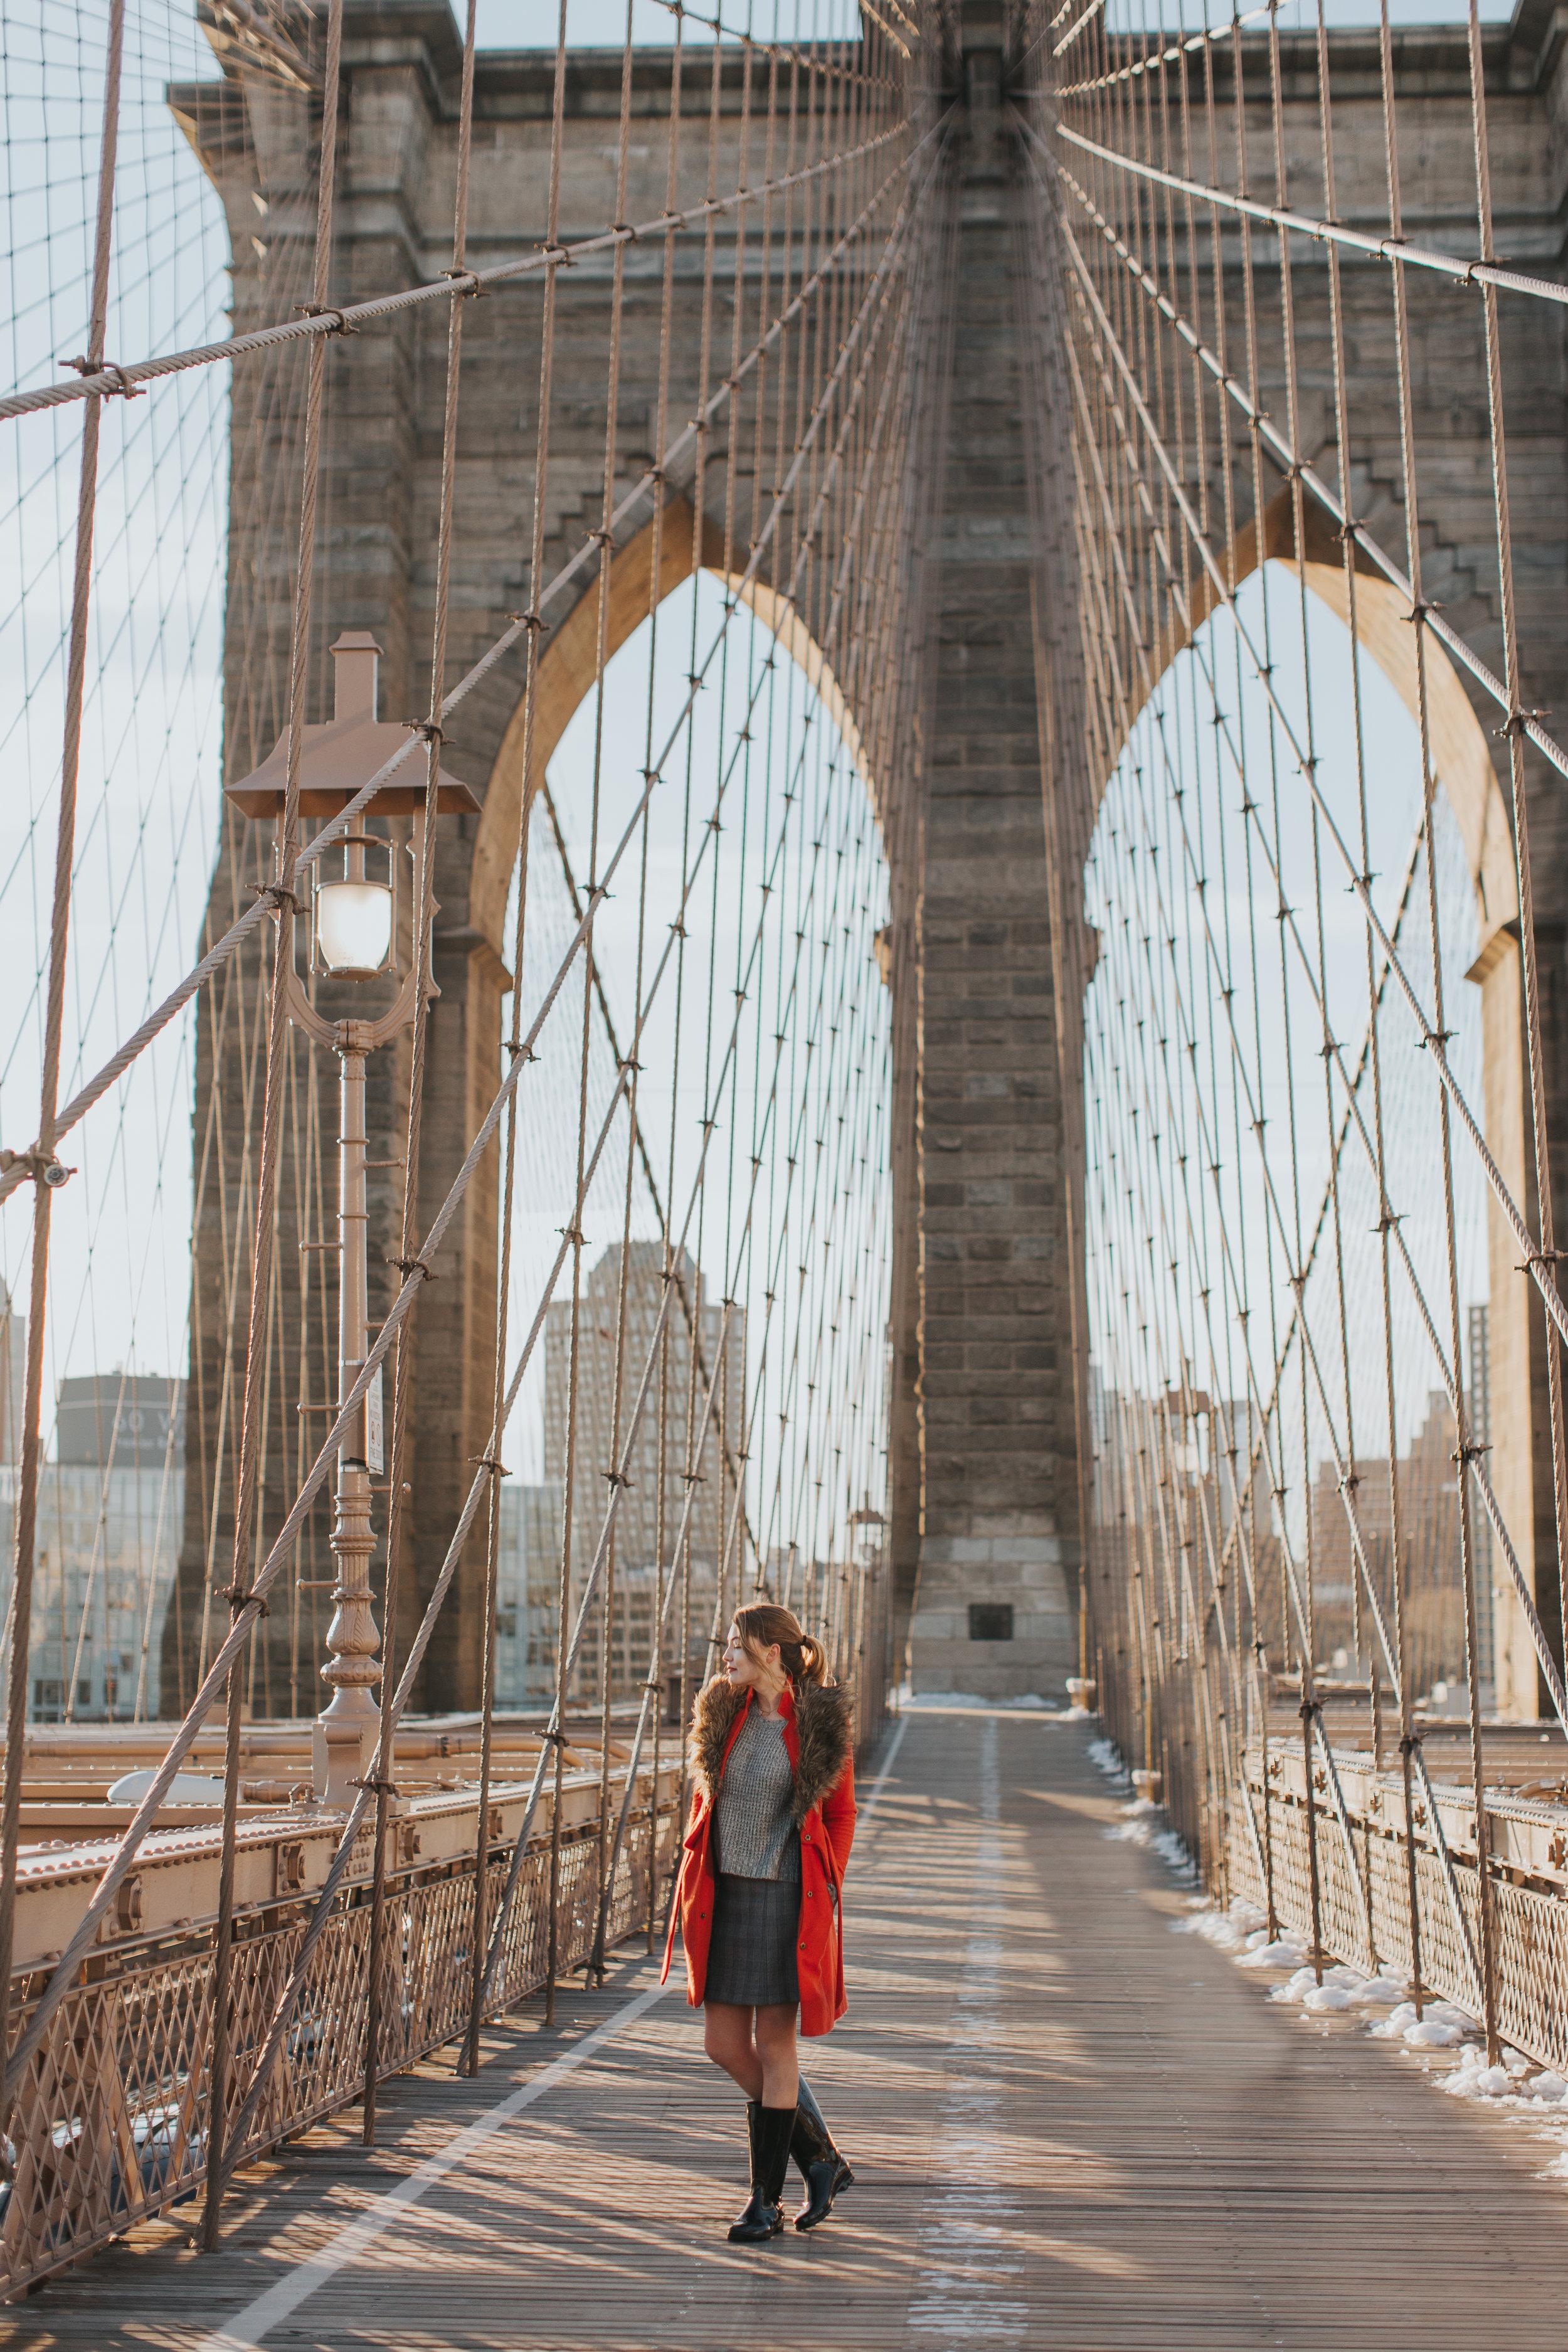 New York City portrait photographer, New york city wedding photographer, Brooklyn bridge portrait, brooklyn bridge photos, brooklyn bridge sunrise session, Brooklyn bridge inspiration515.JPG